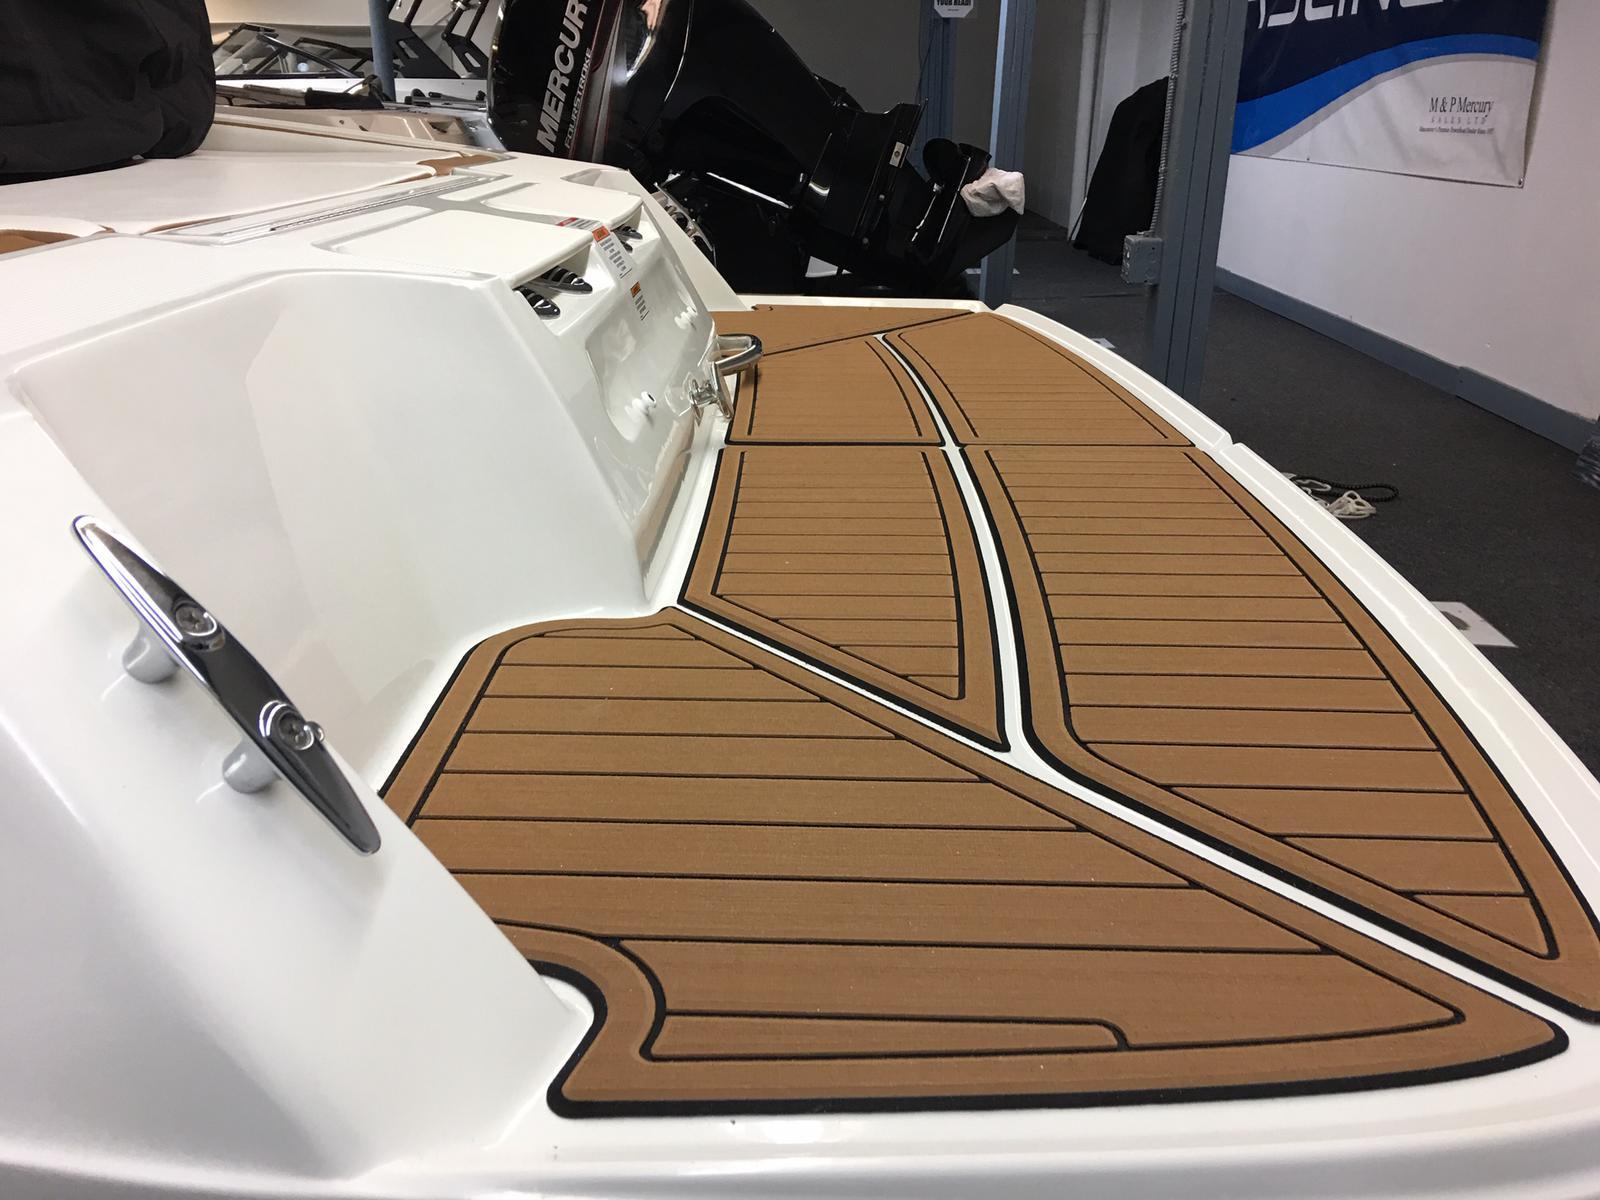 2019 Boats from Bayliner M & P Mercury Sales Ltd